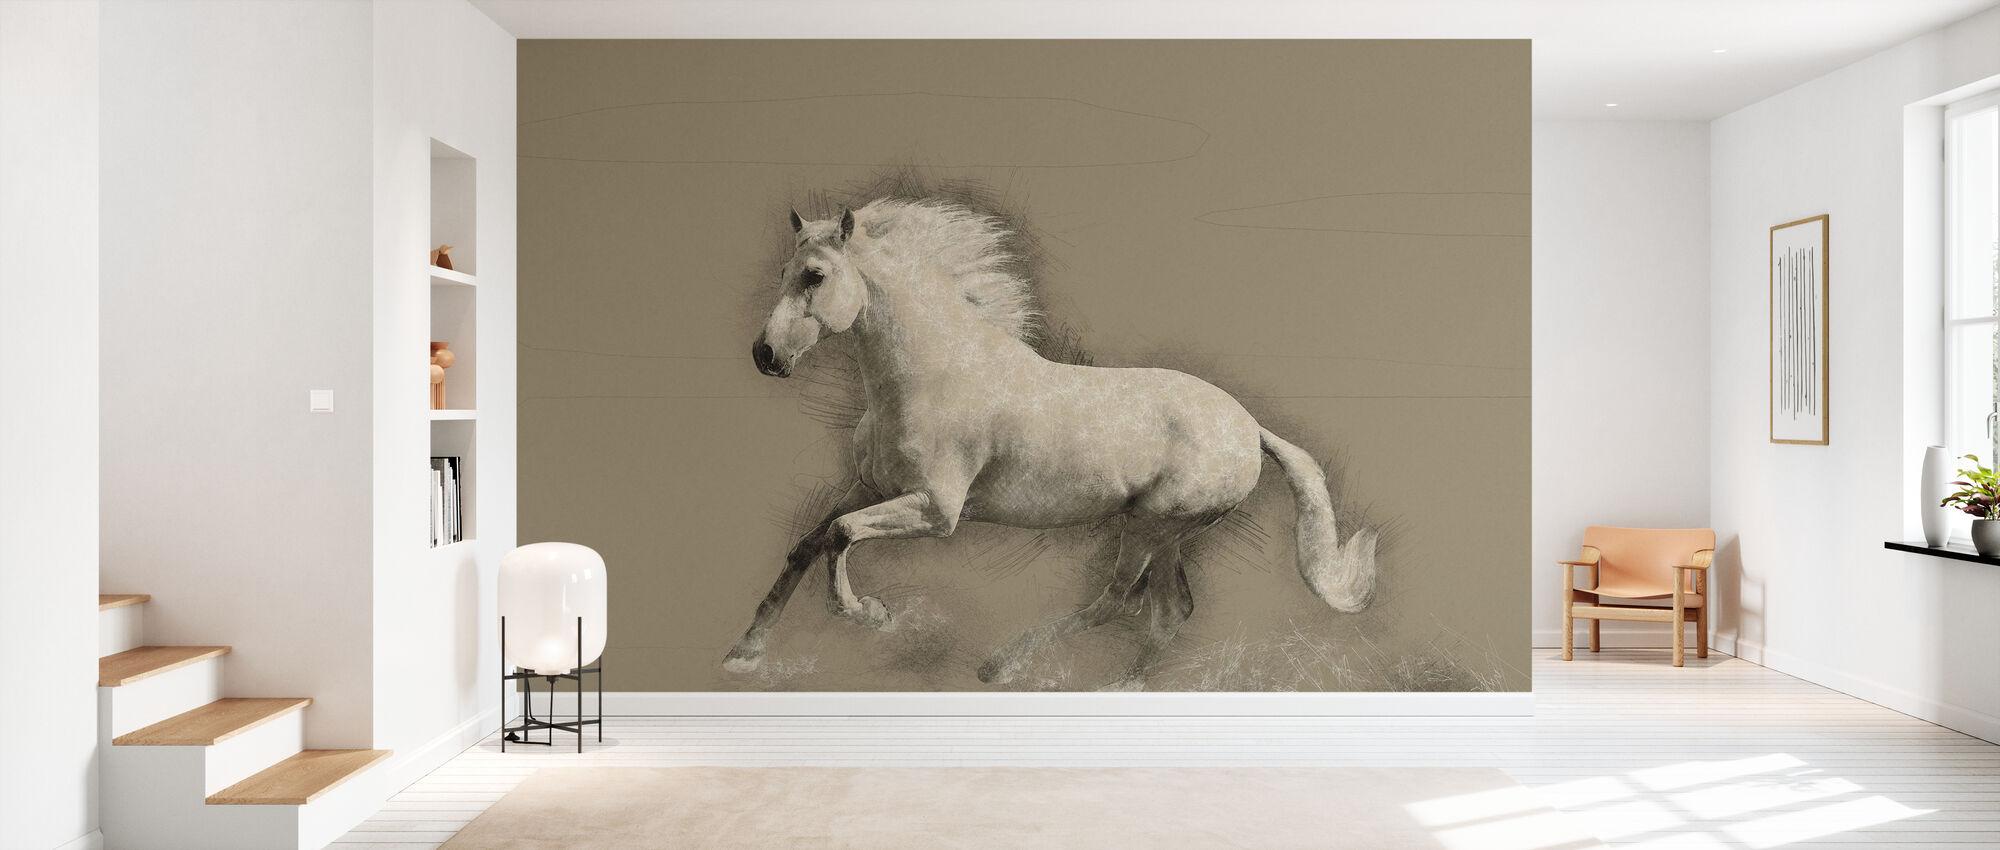 Horse Drawing - Wallpaper - Hallway